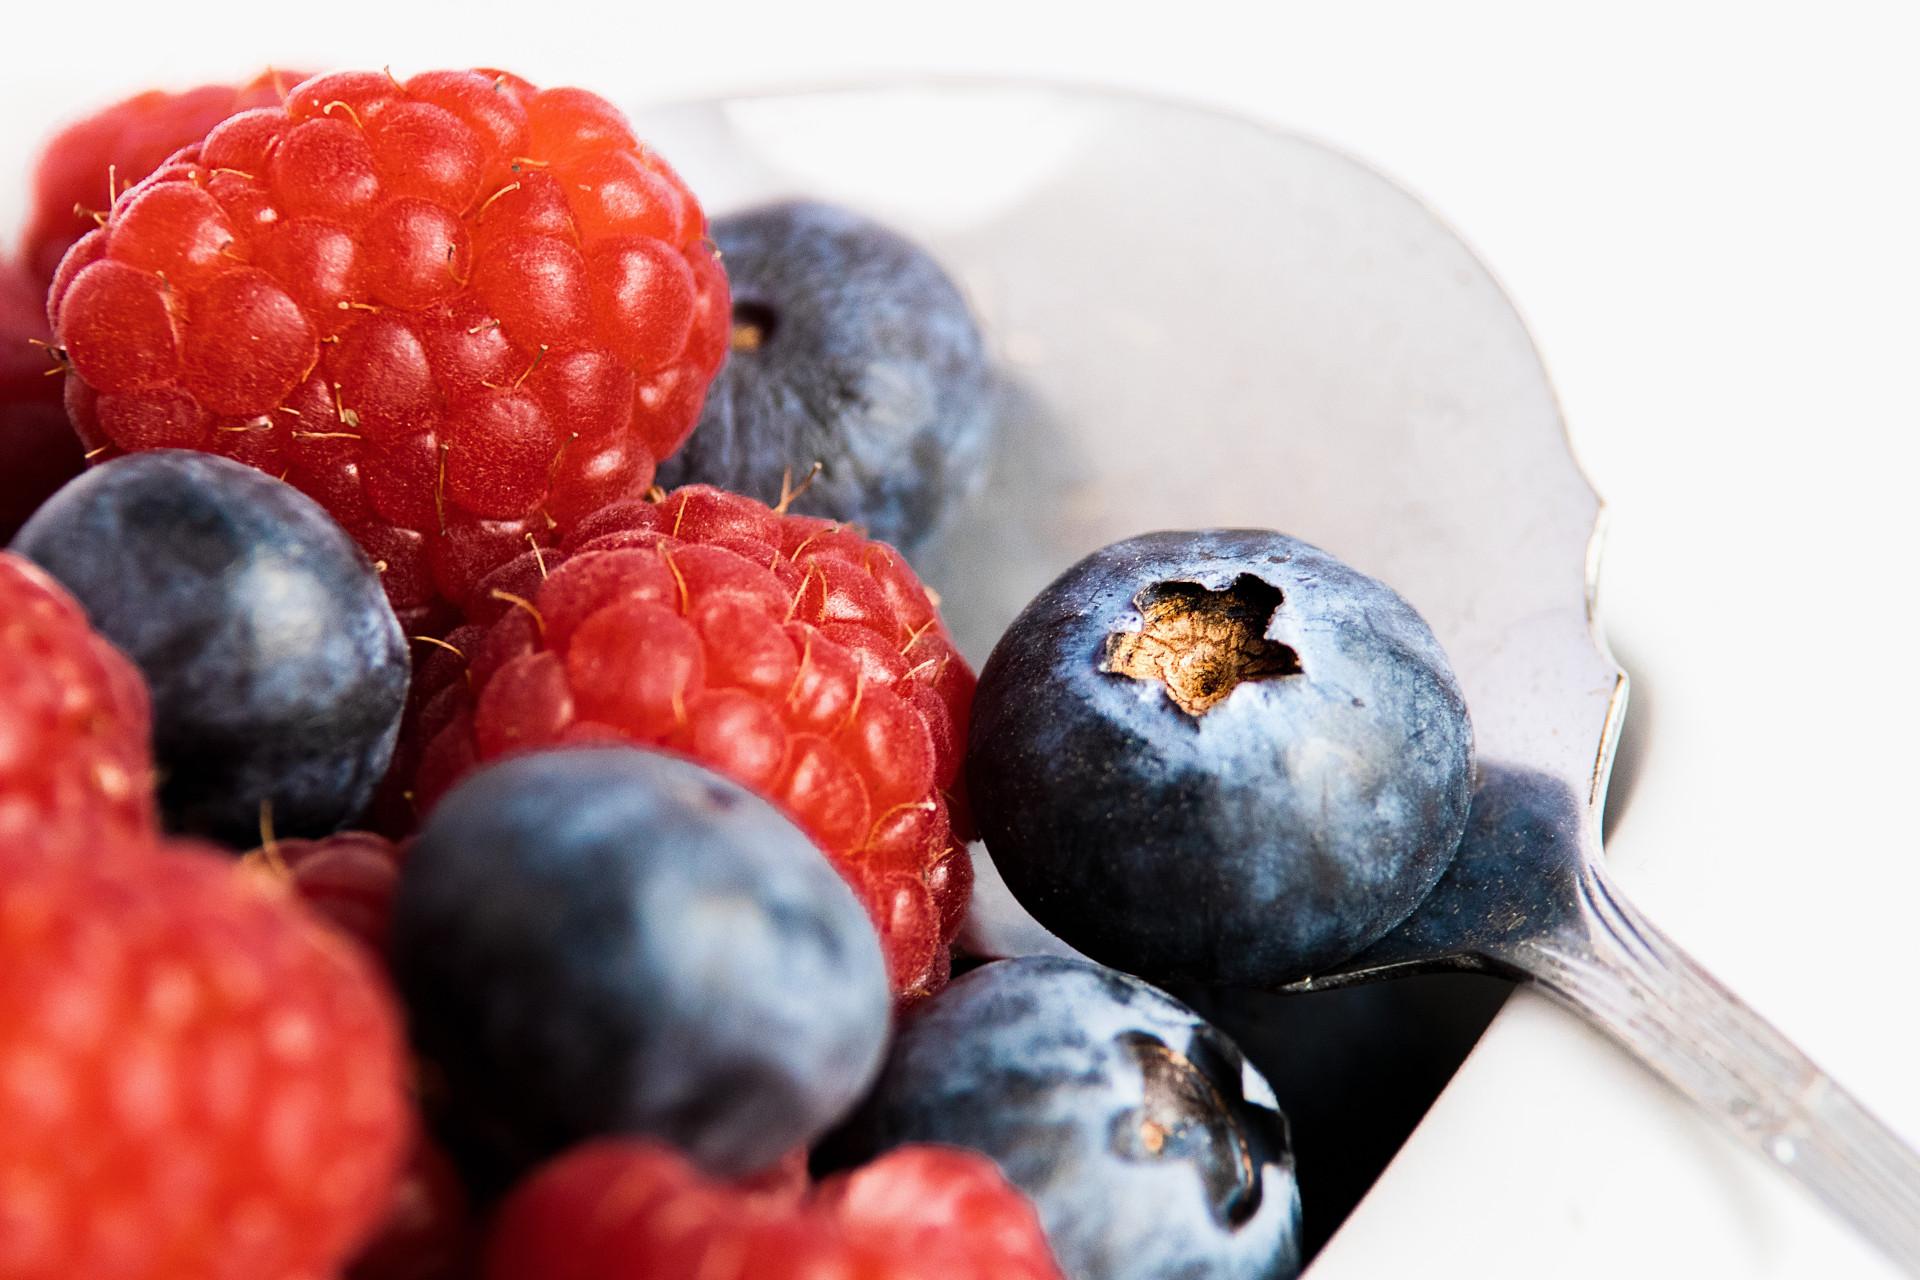 carnivore diet and berries